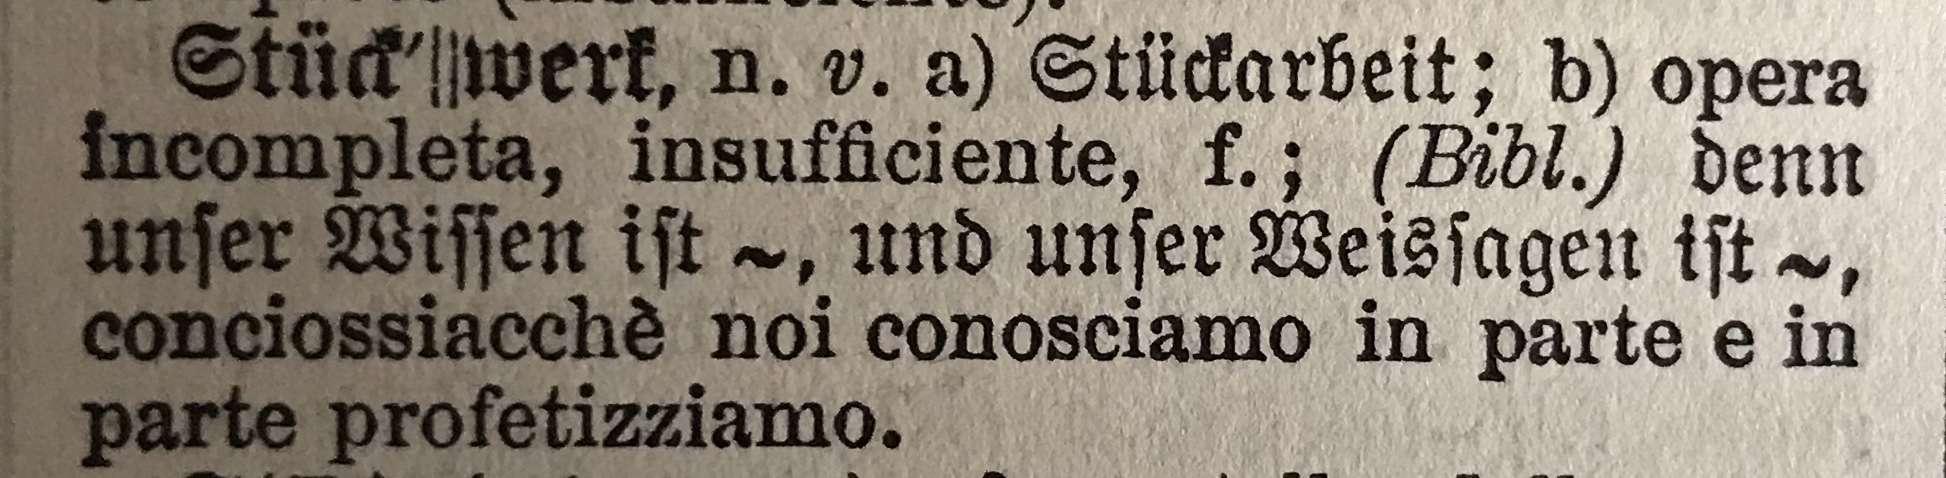 Stückwerk nel Dizionario Tedesco-Italiano Rigutini Bulle